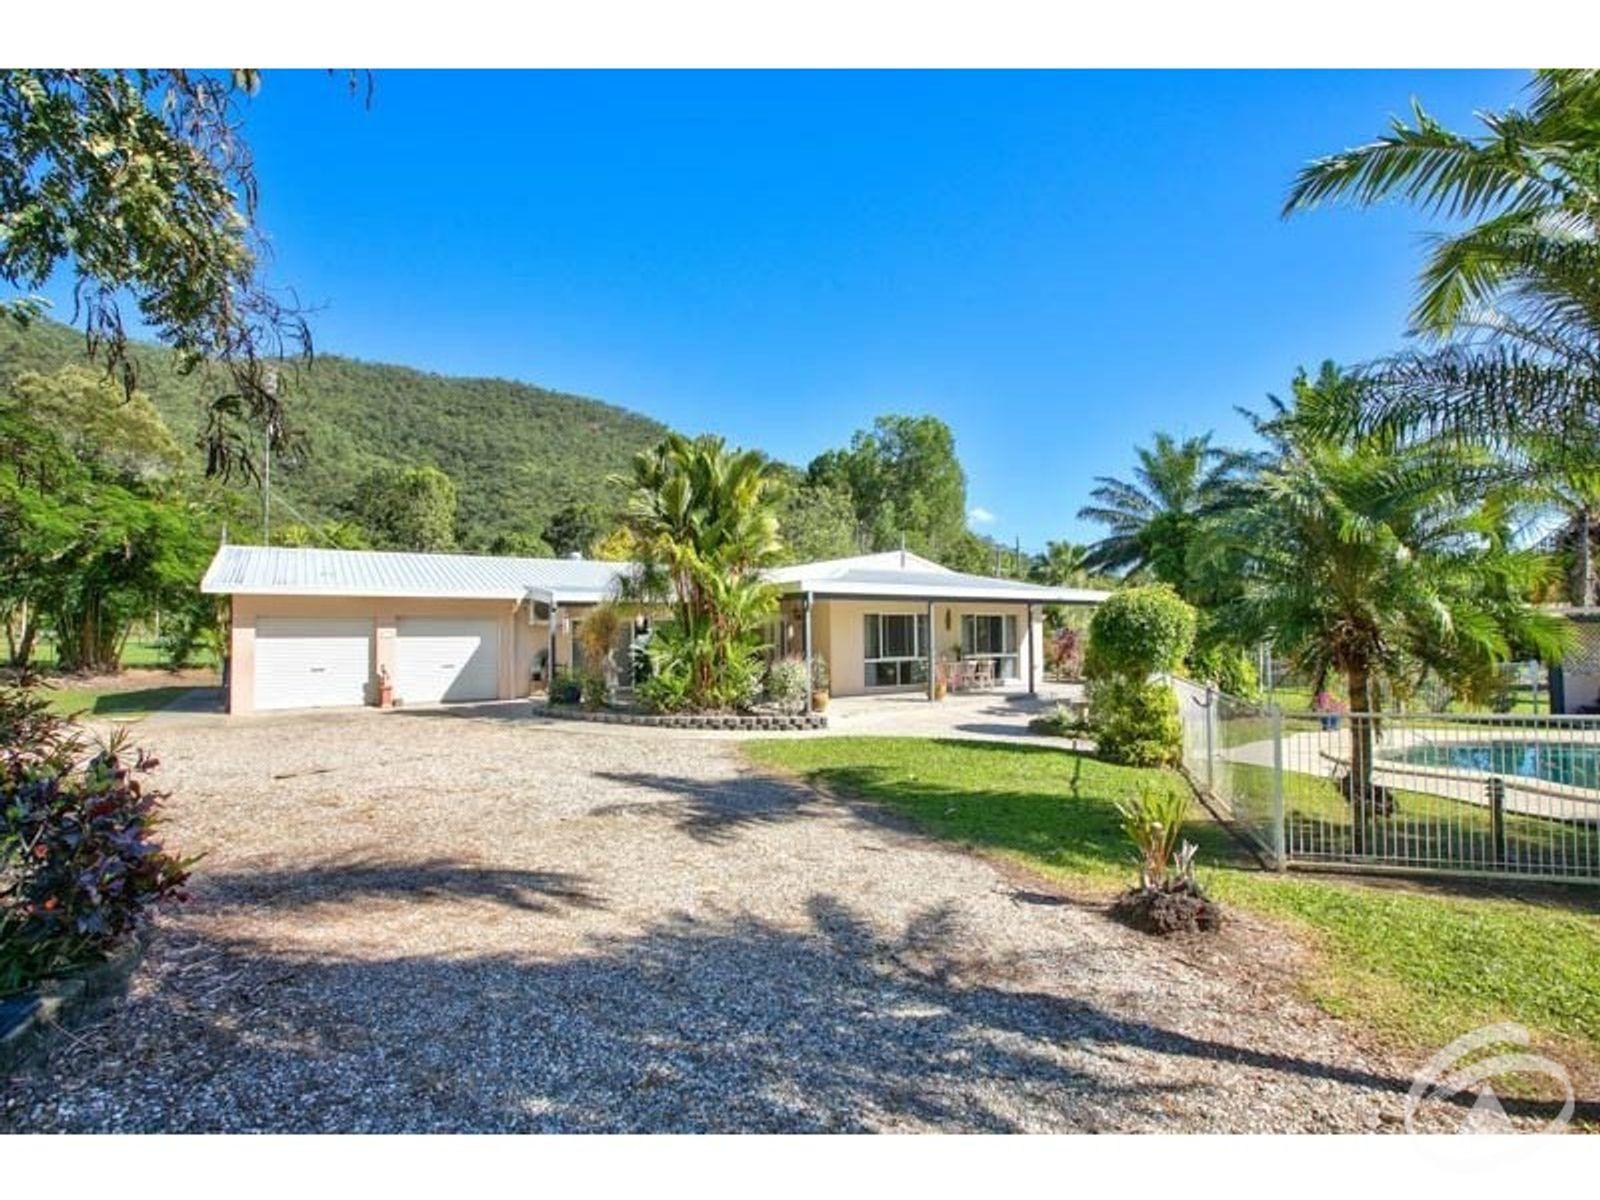 173-175 Dempsey Street, Gordonvale, QLD 4865